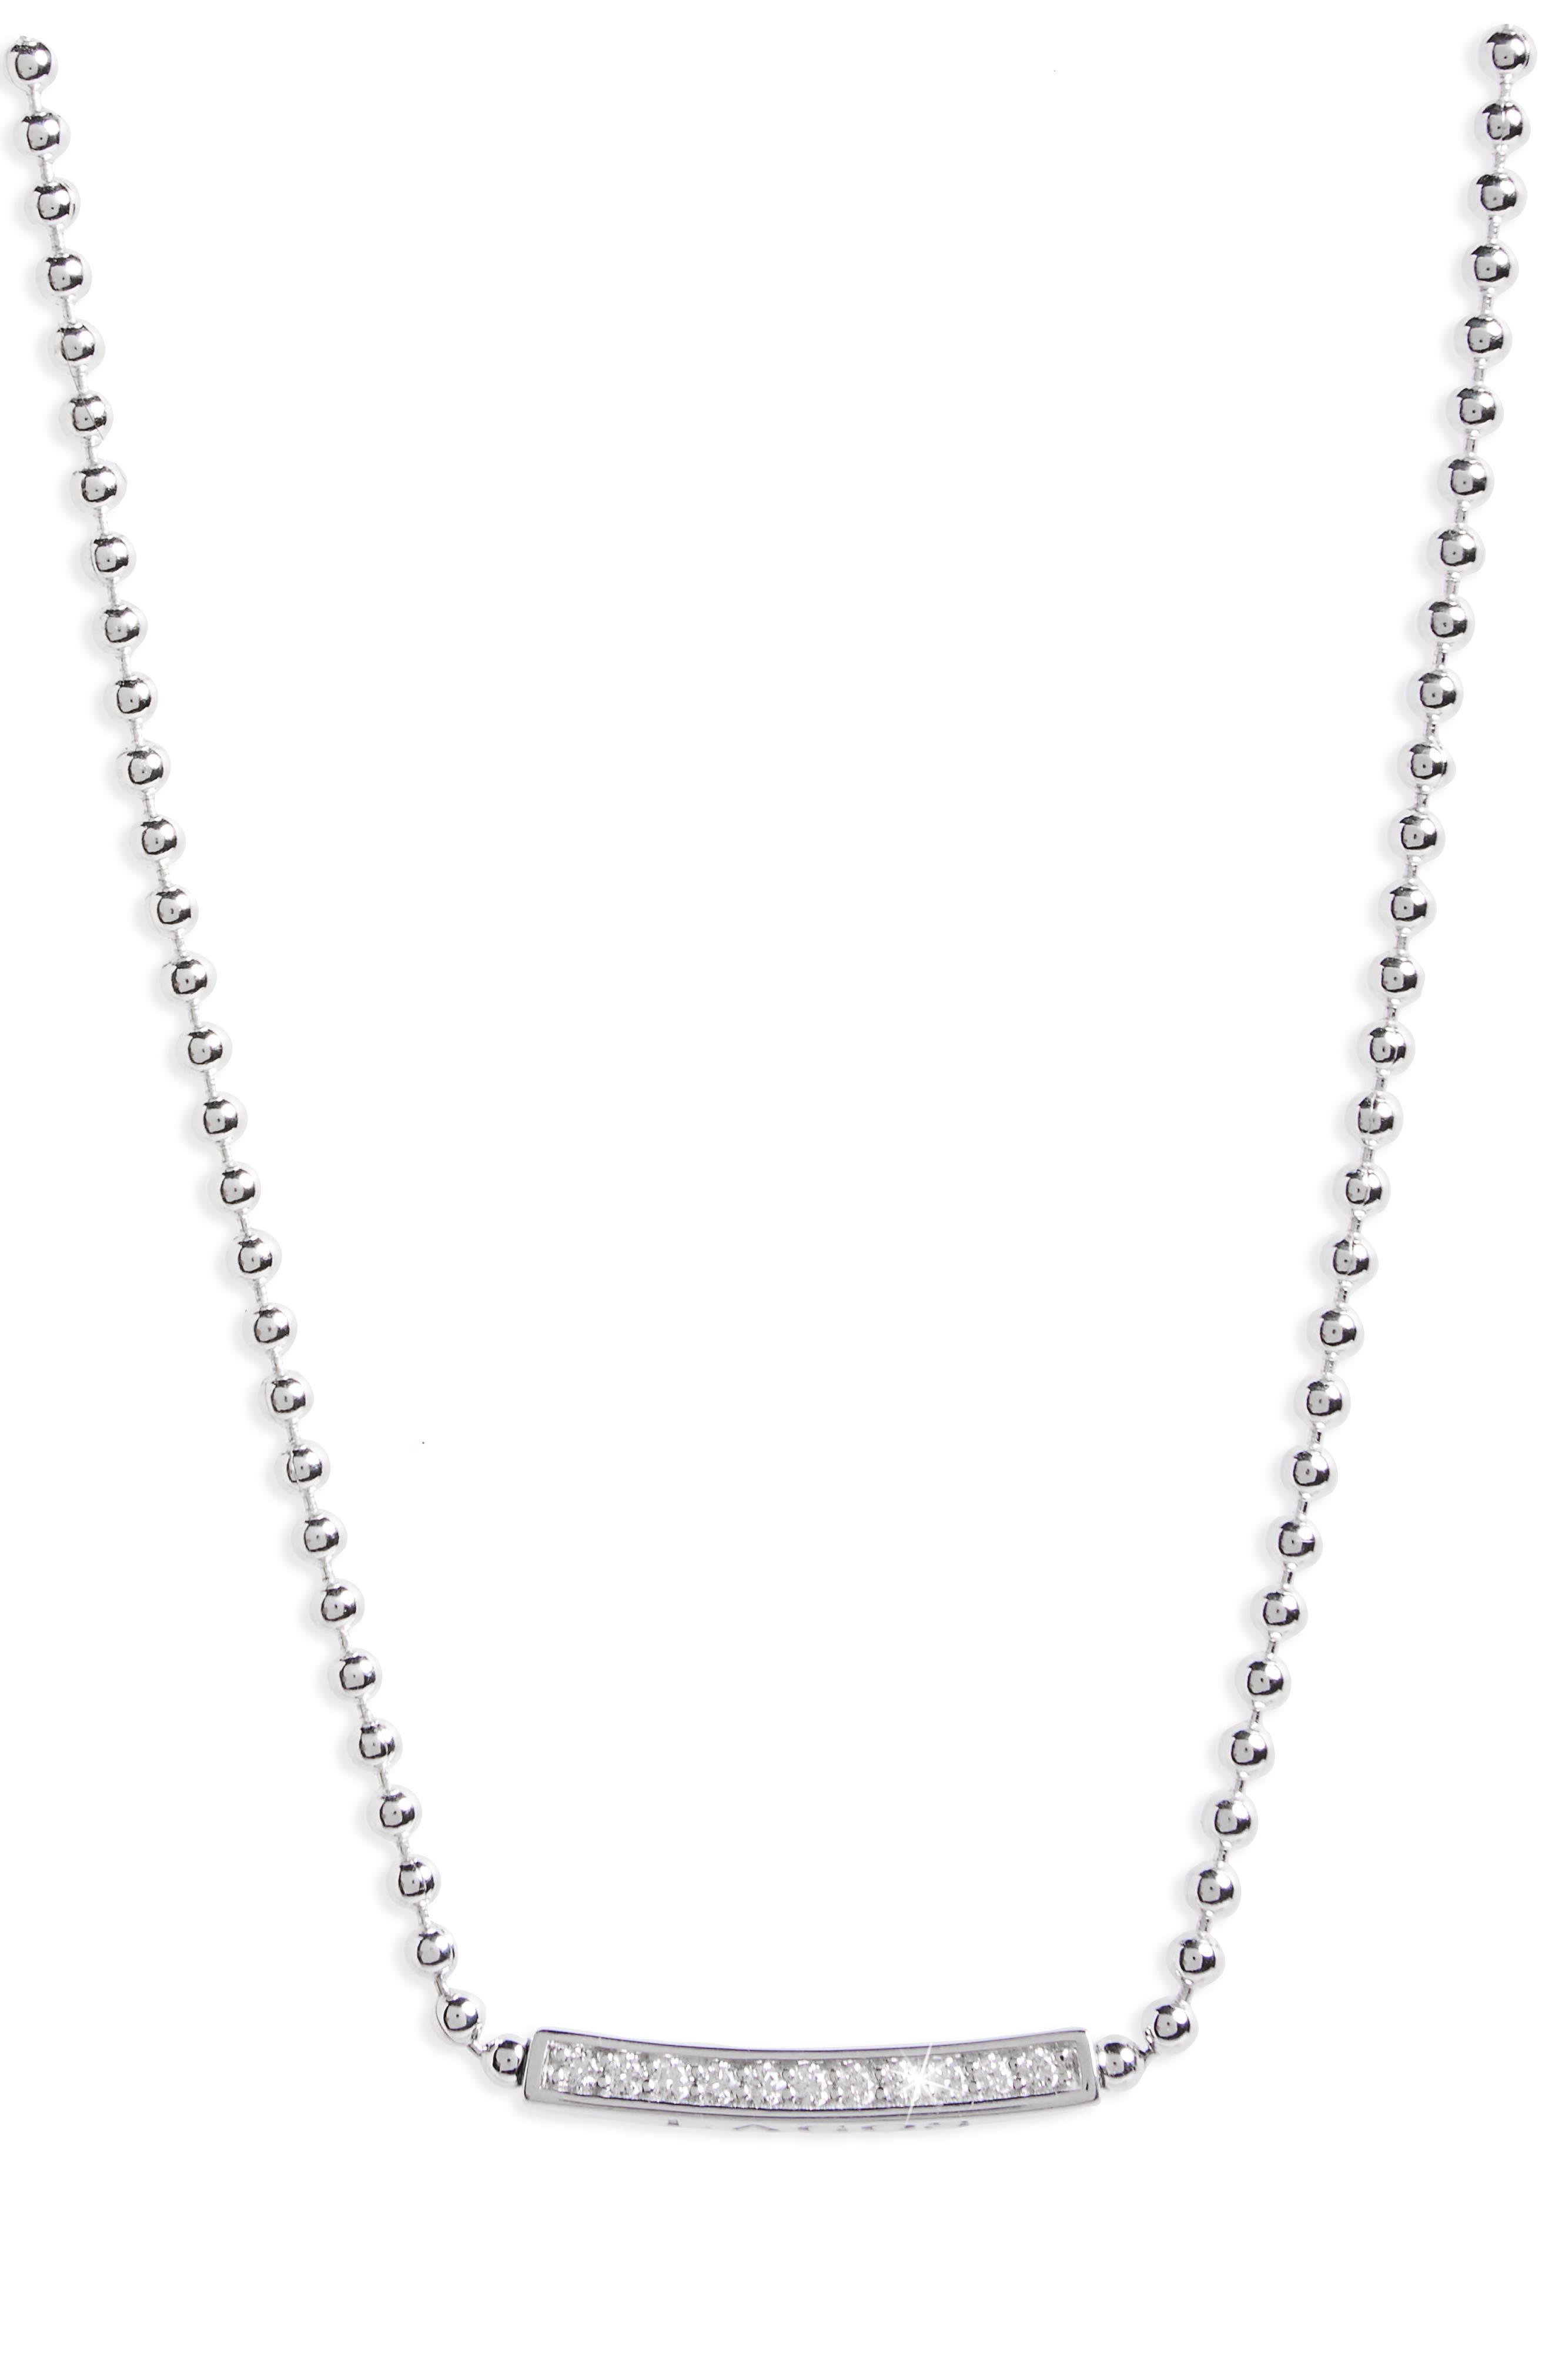 Caviar Spark Diamond Pendant Necklace,                             Main thumbnail 1, color,                             SILVER/ DIAMOND